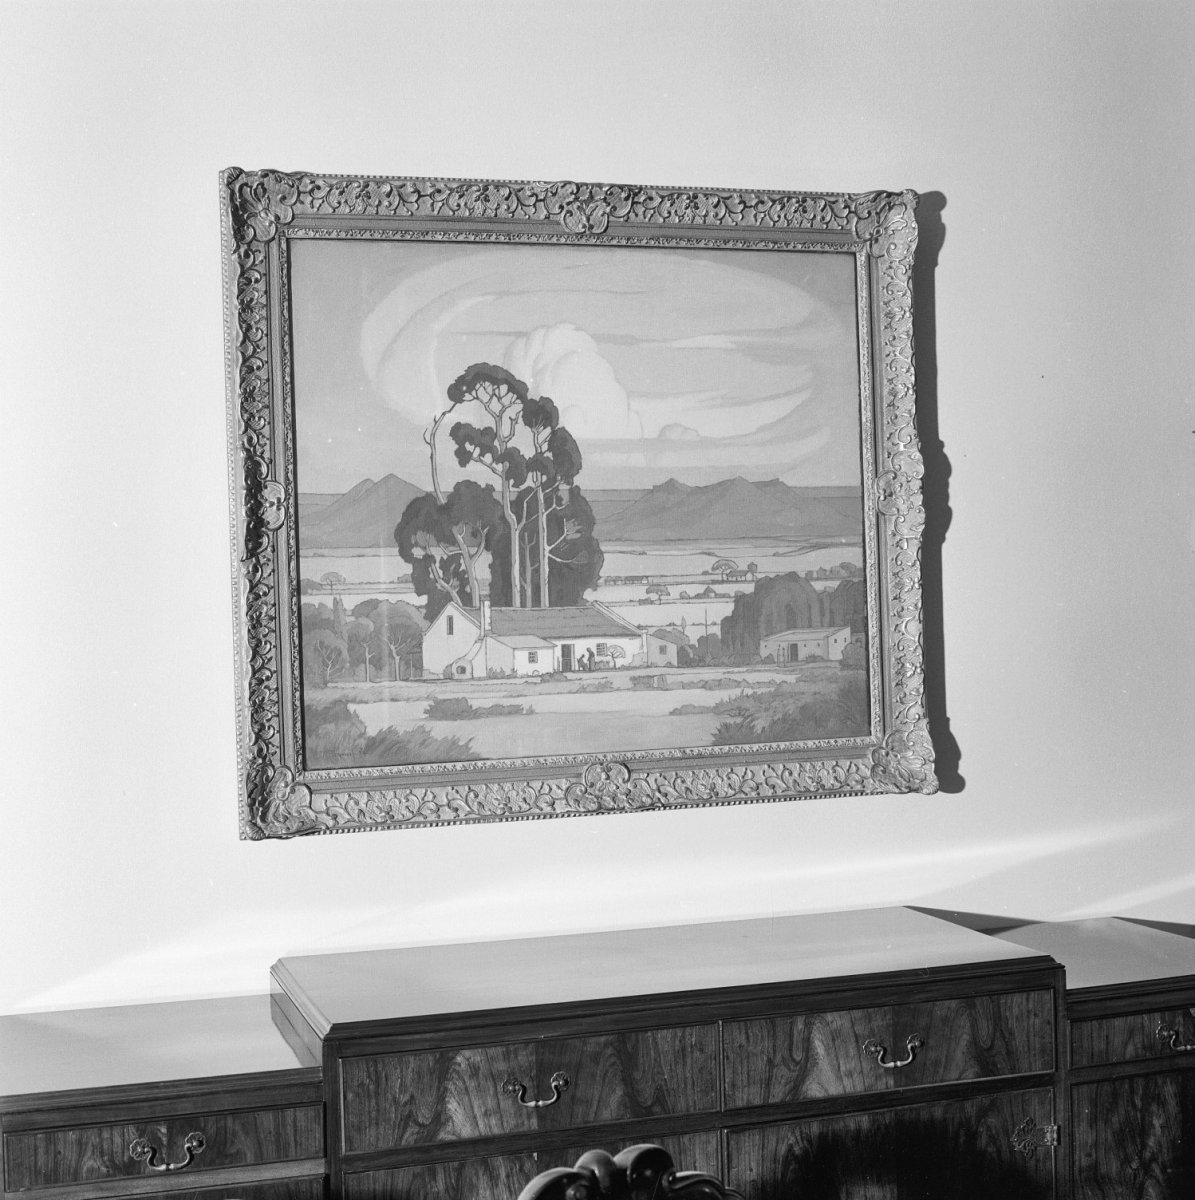 File interieur schilderij in grote kamer 39 s gravenhage 20329657 wikimedia commons - Schilderij in de kamer ...